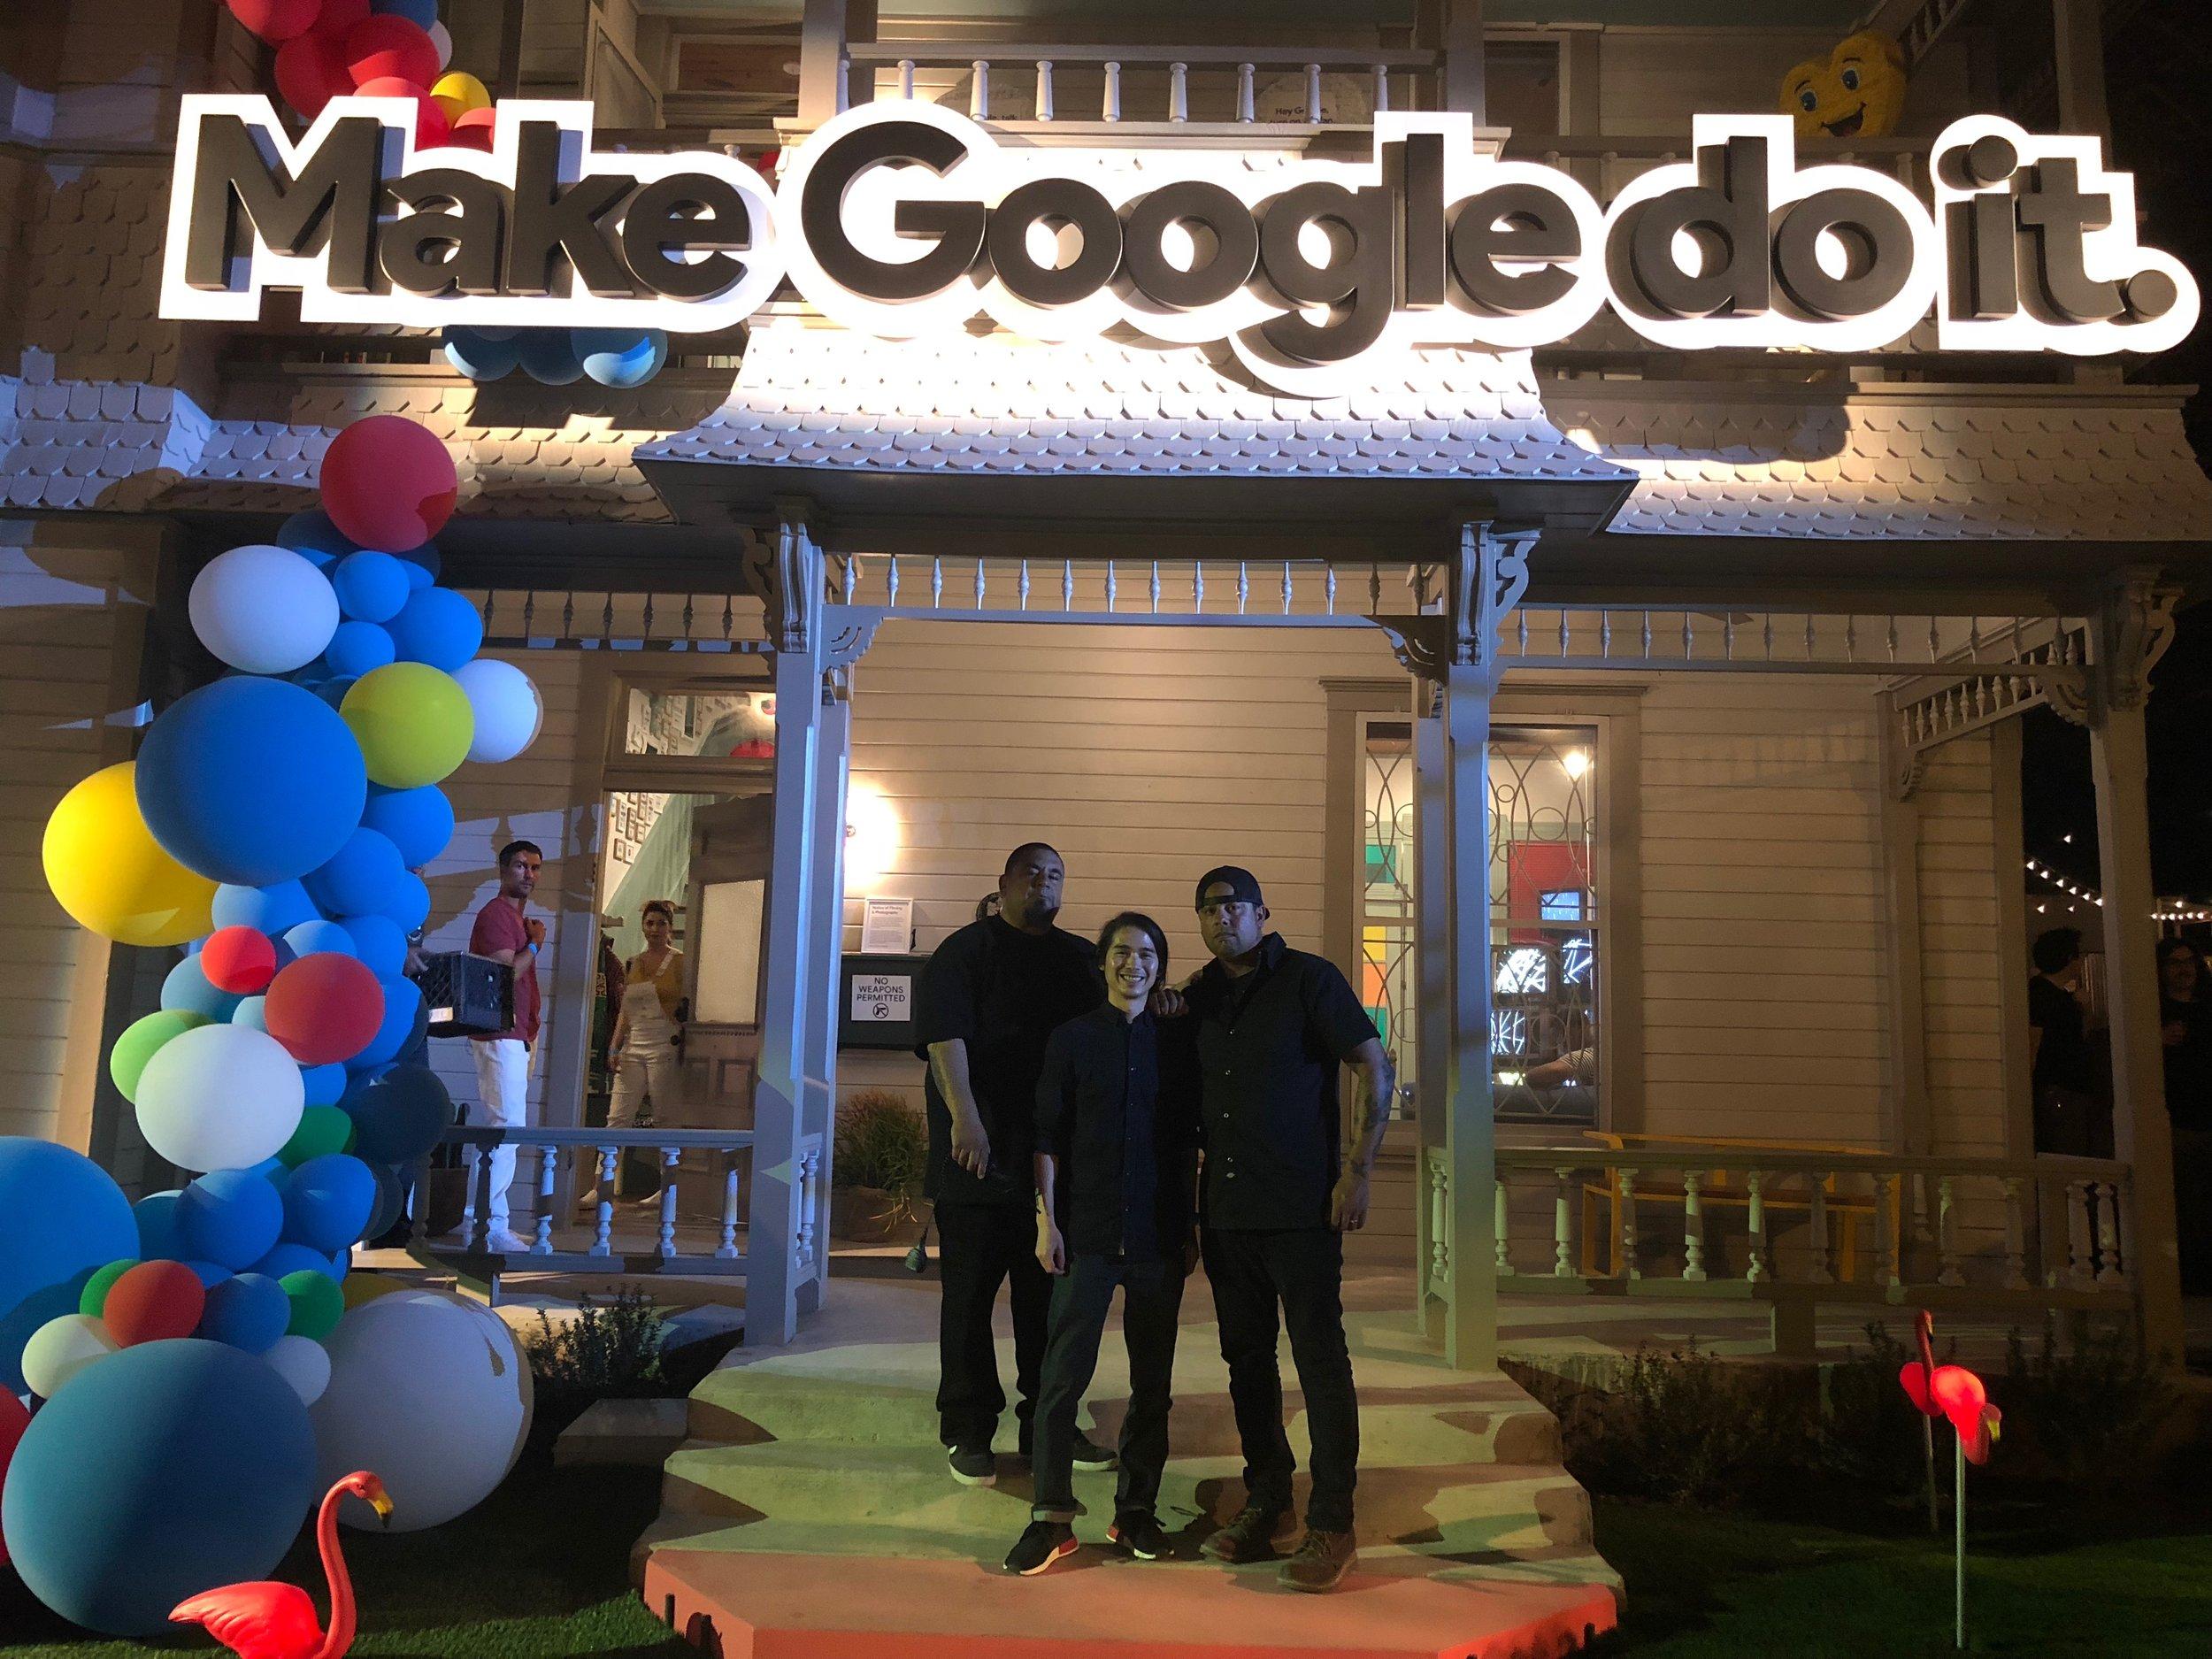 Google_House_2